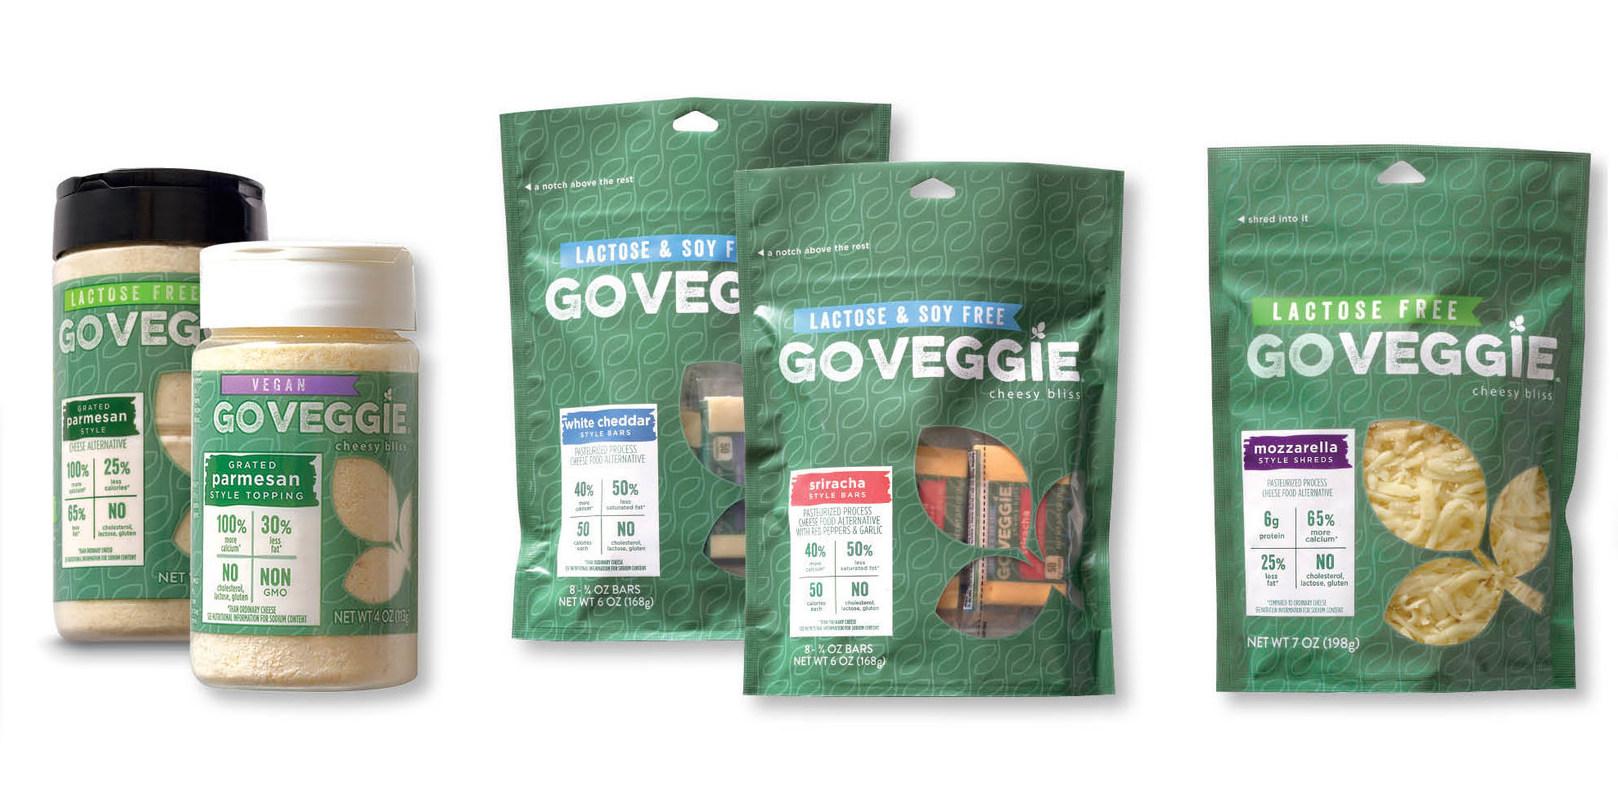 GO VEGGIE Goes All Green! (PRNewsFoto/GO VEGGIE)